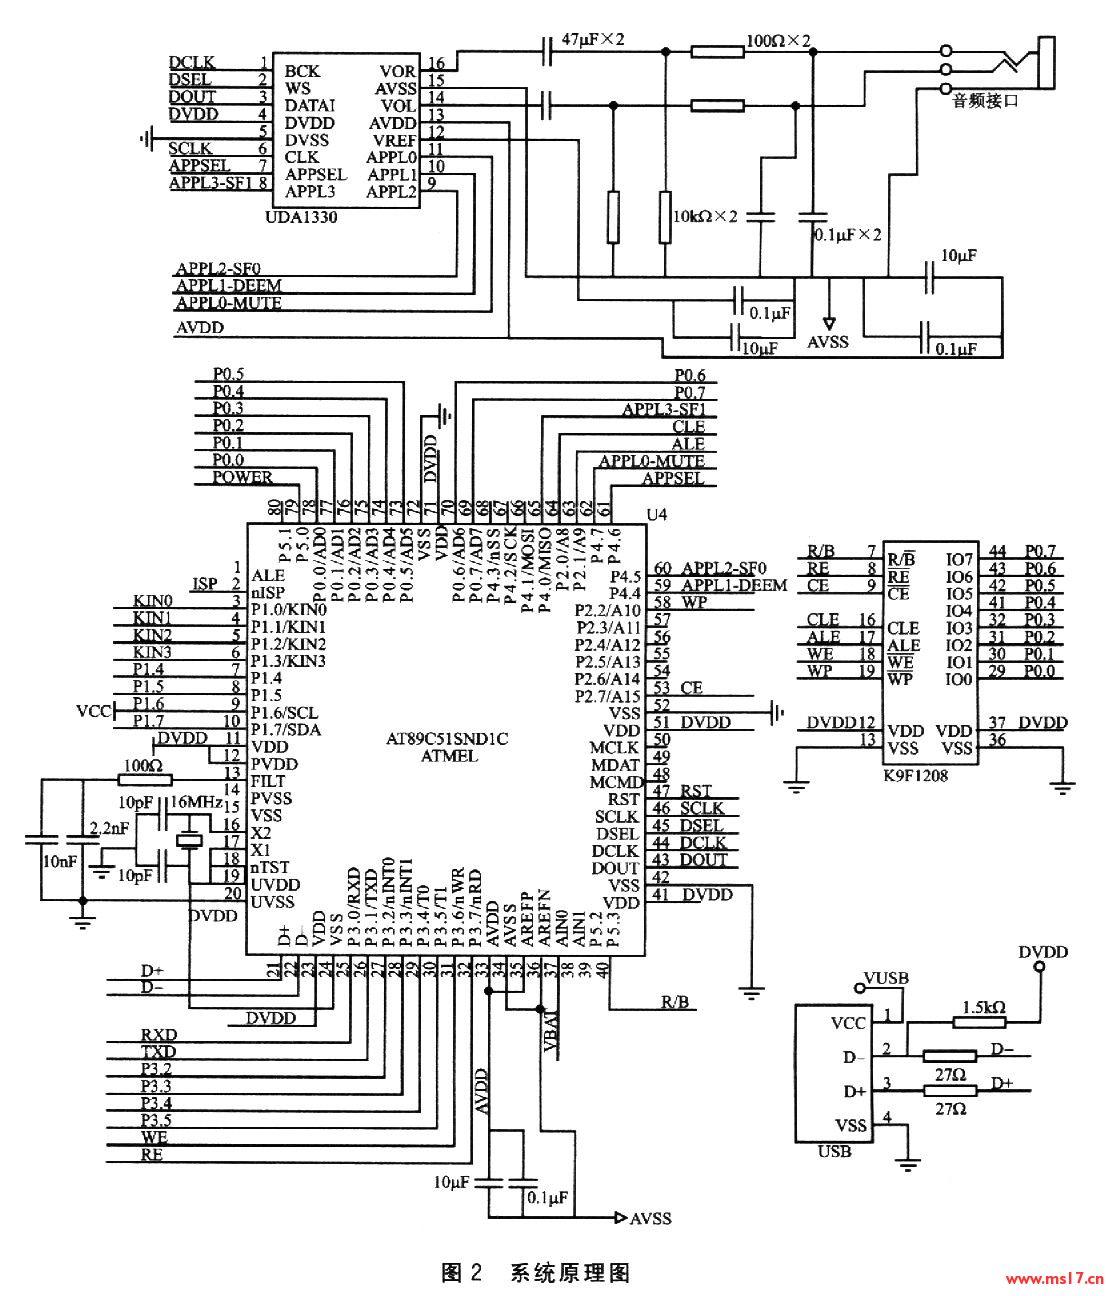 at89c51sndlc芯片内部的解码电路支持mepg i/ii声音格式第三层格式的